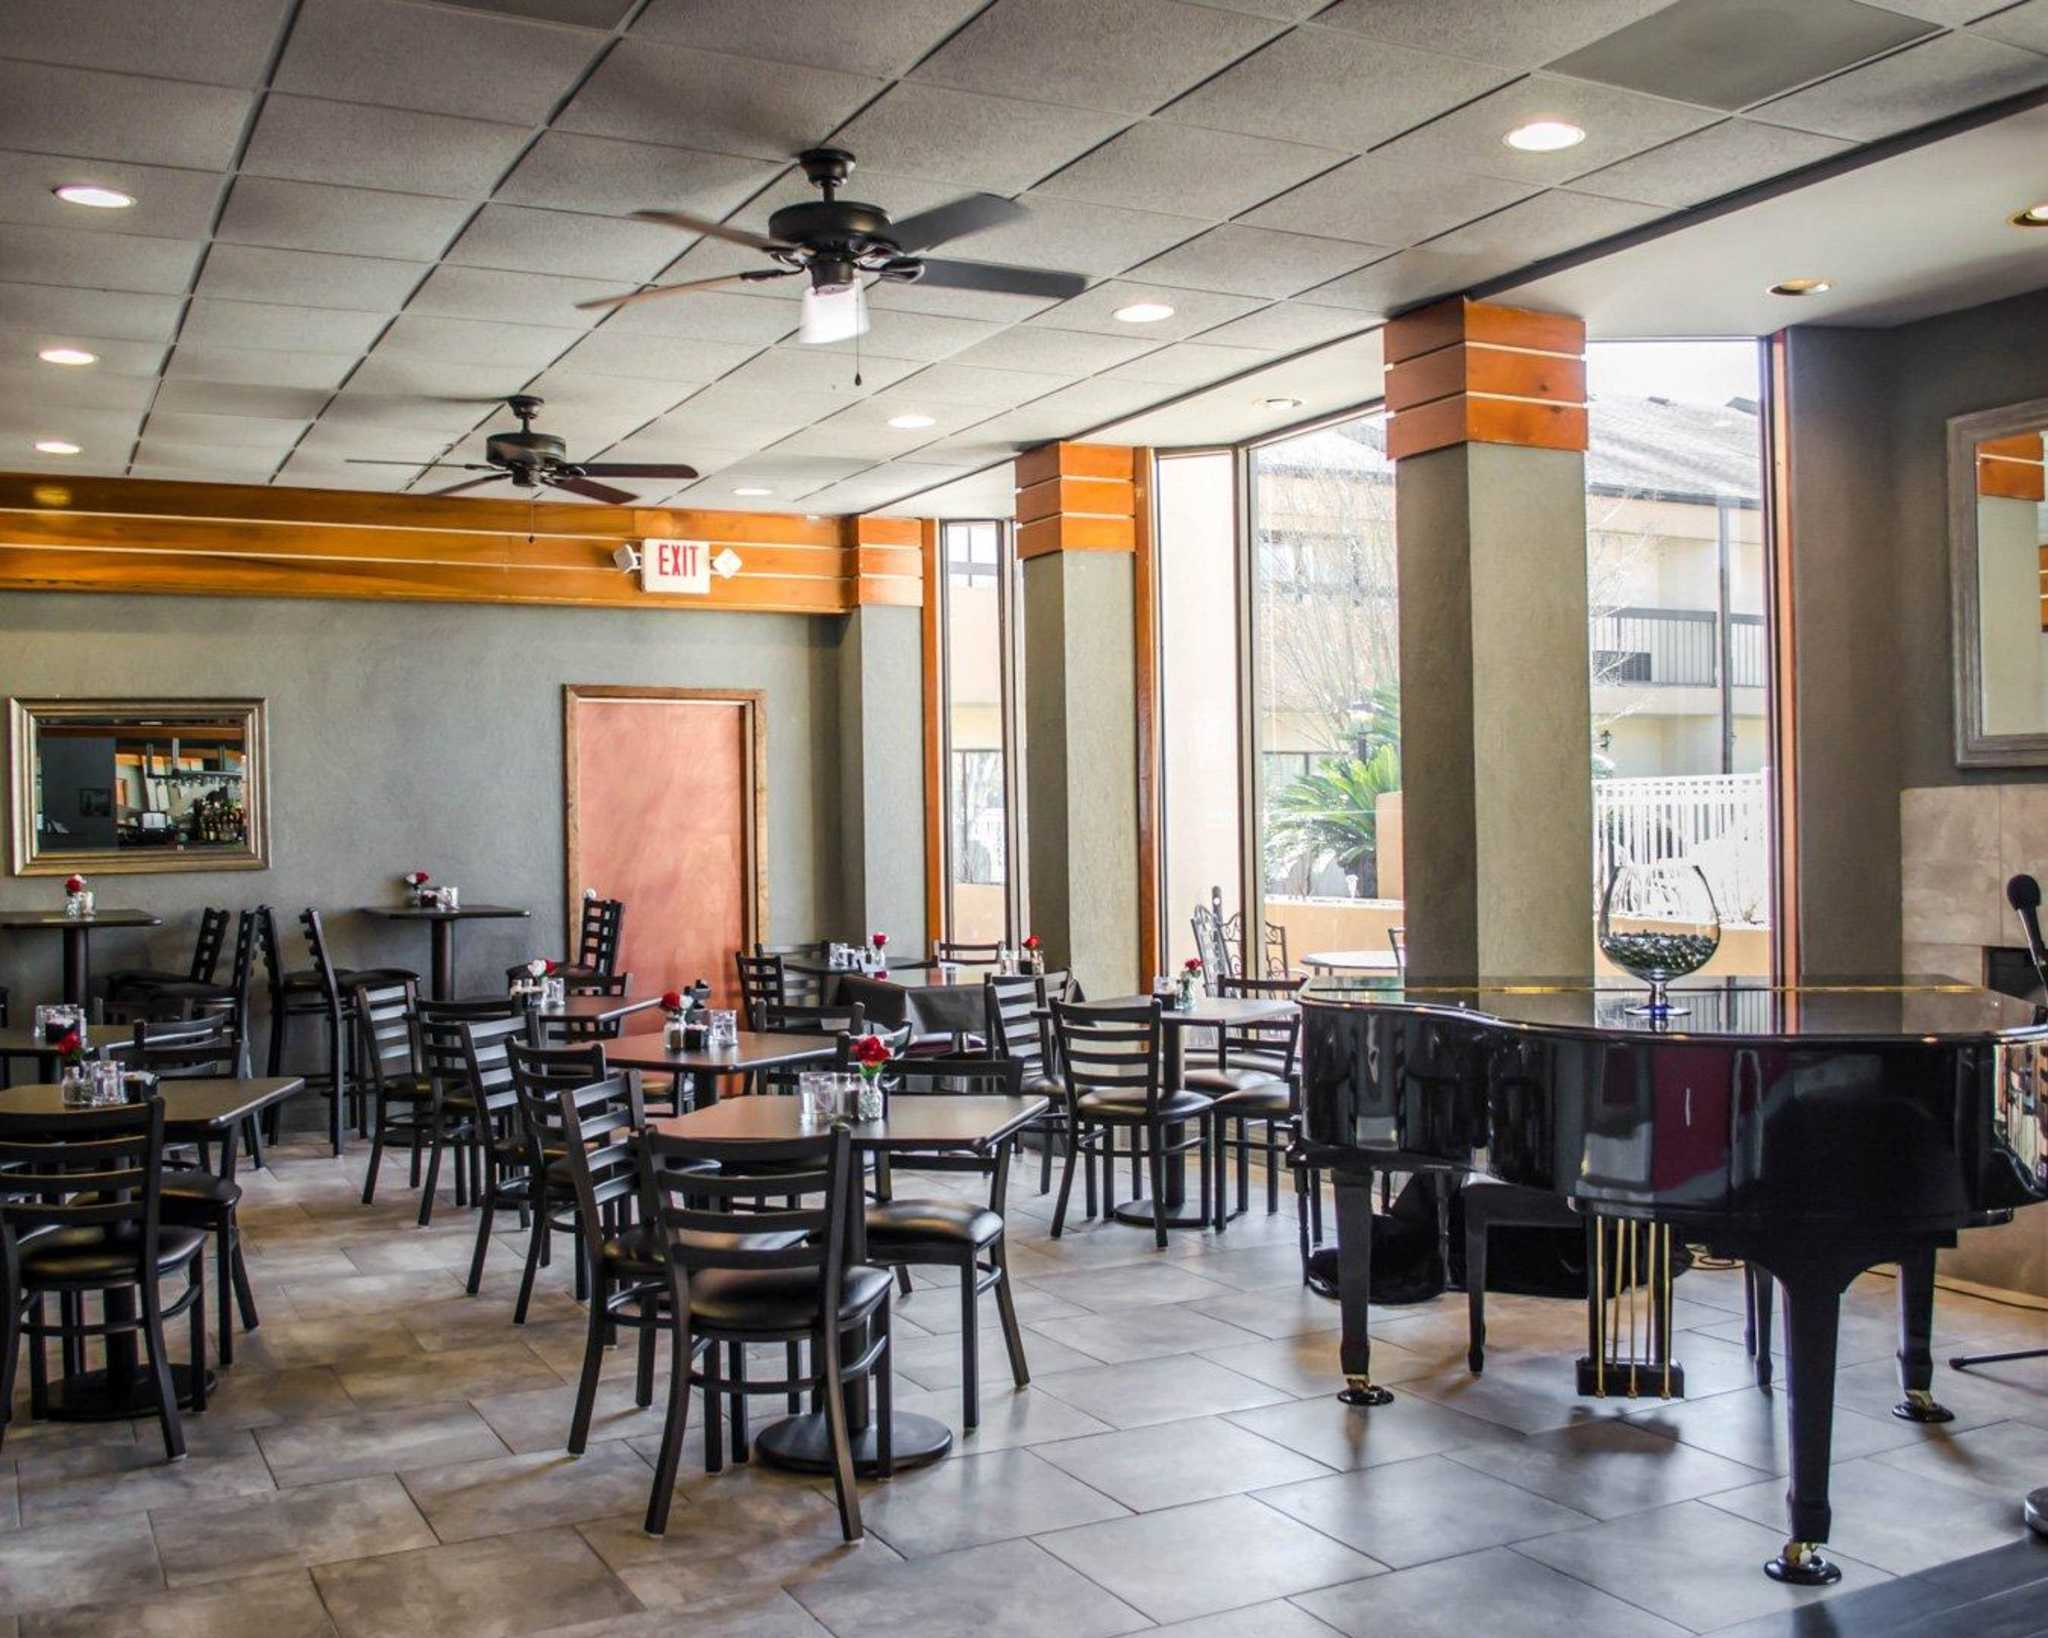 Quality Inn & Suites Pensacola Bayview in Pensacola, FL, photo #19